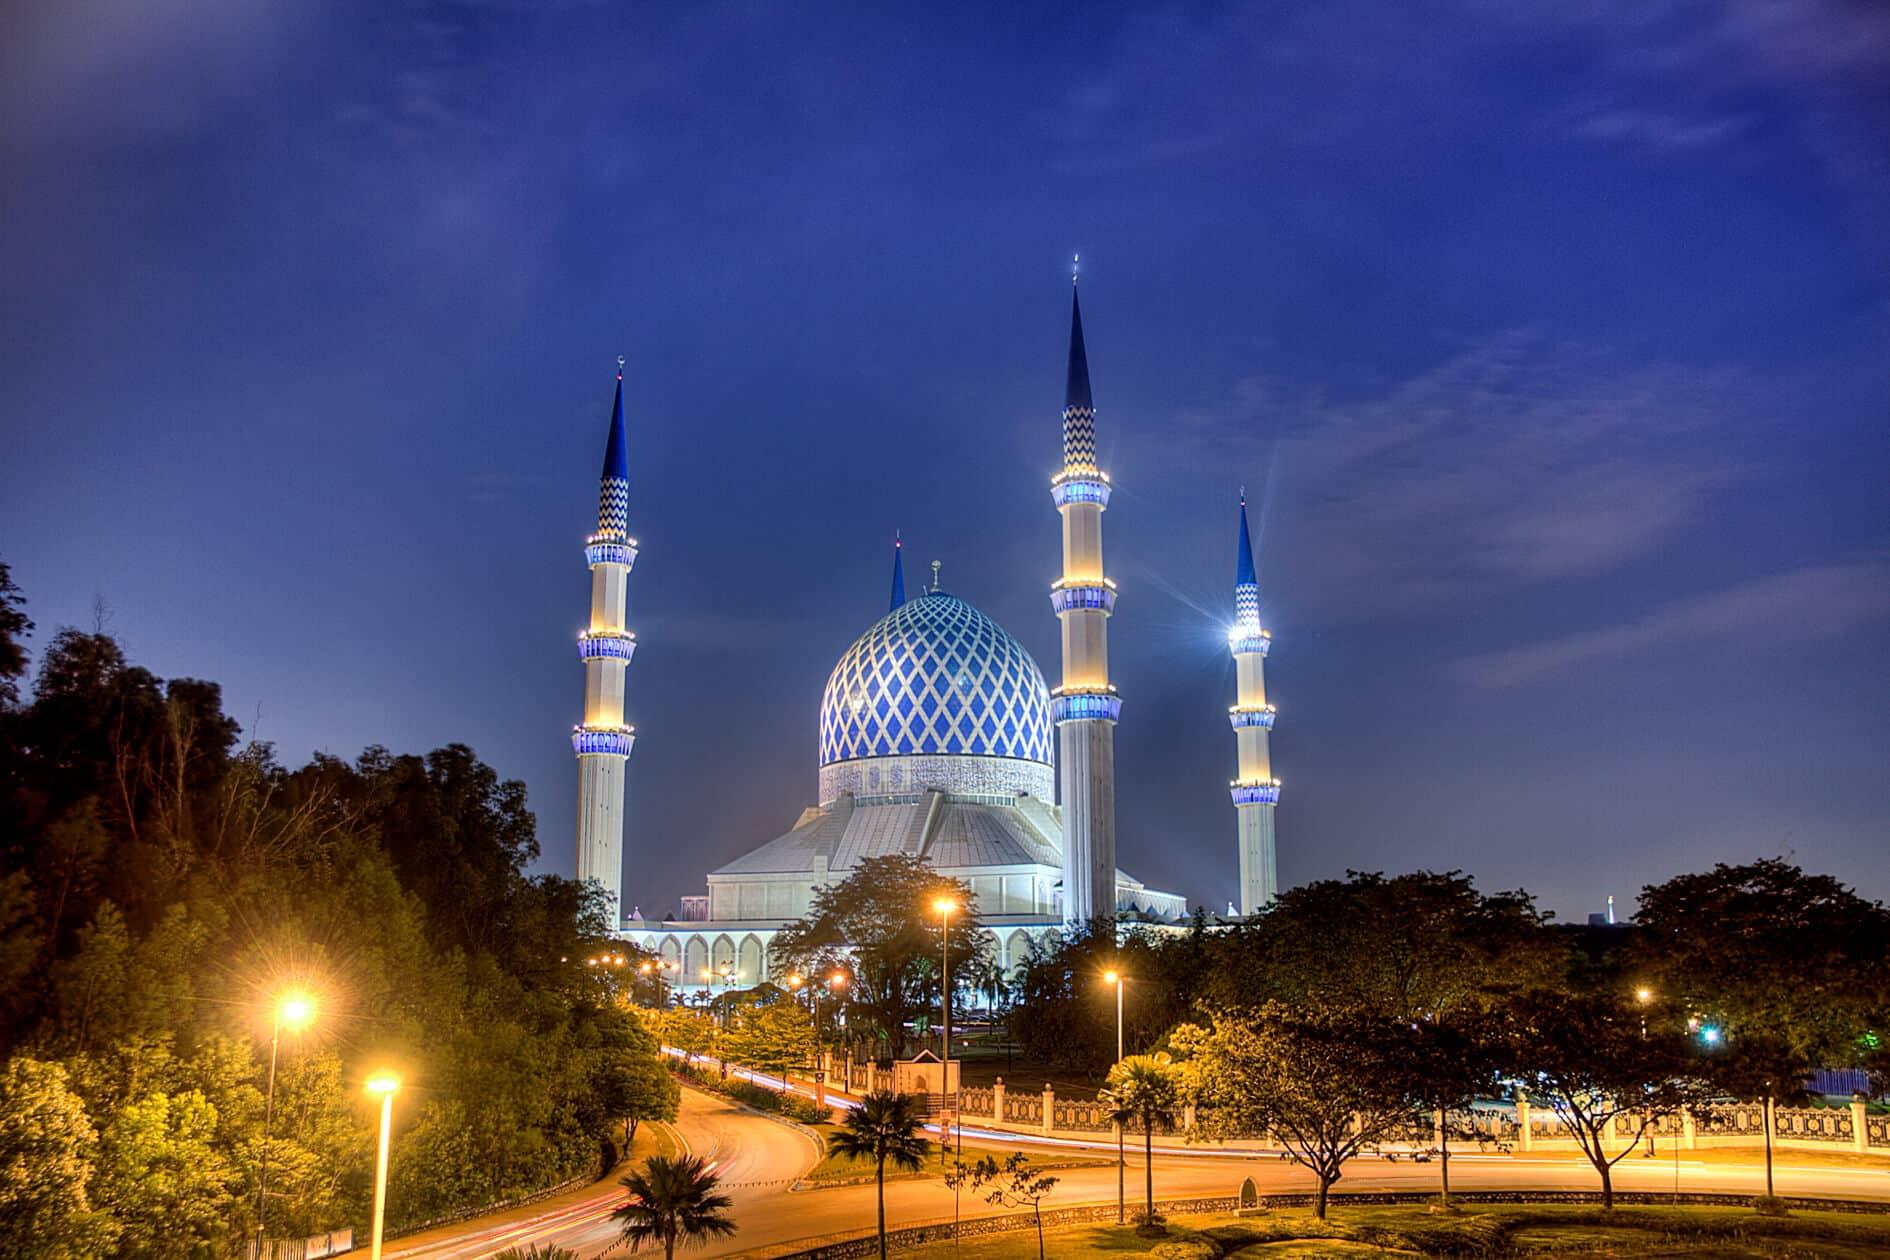 Masjid Sultan Salahuddin